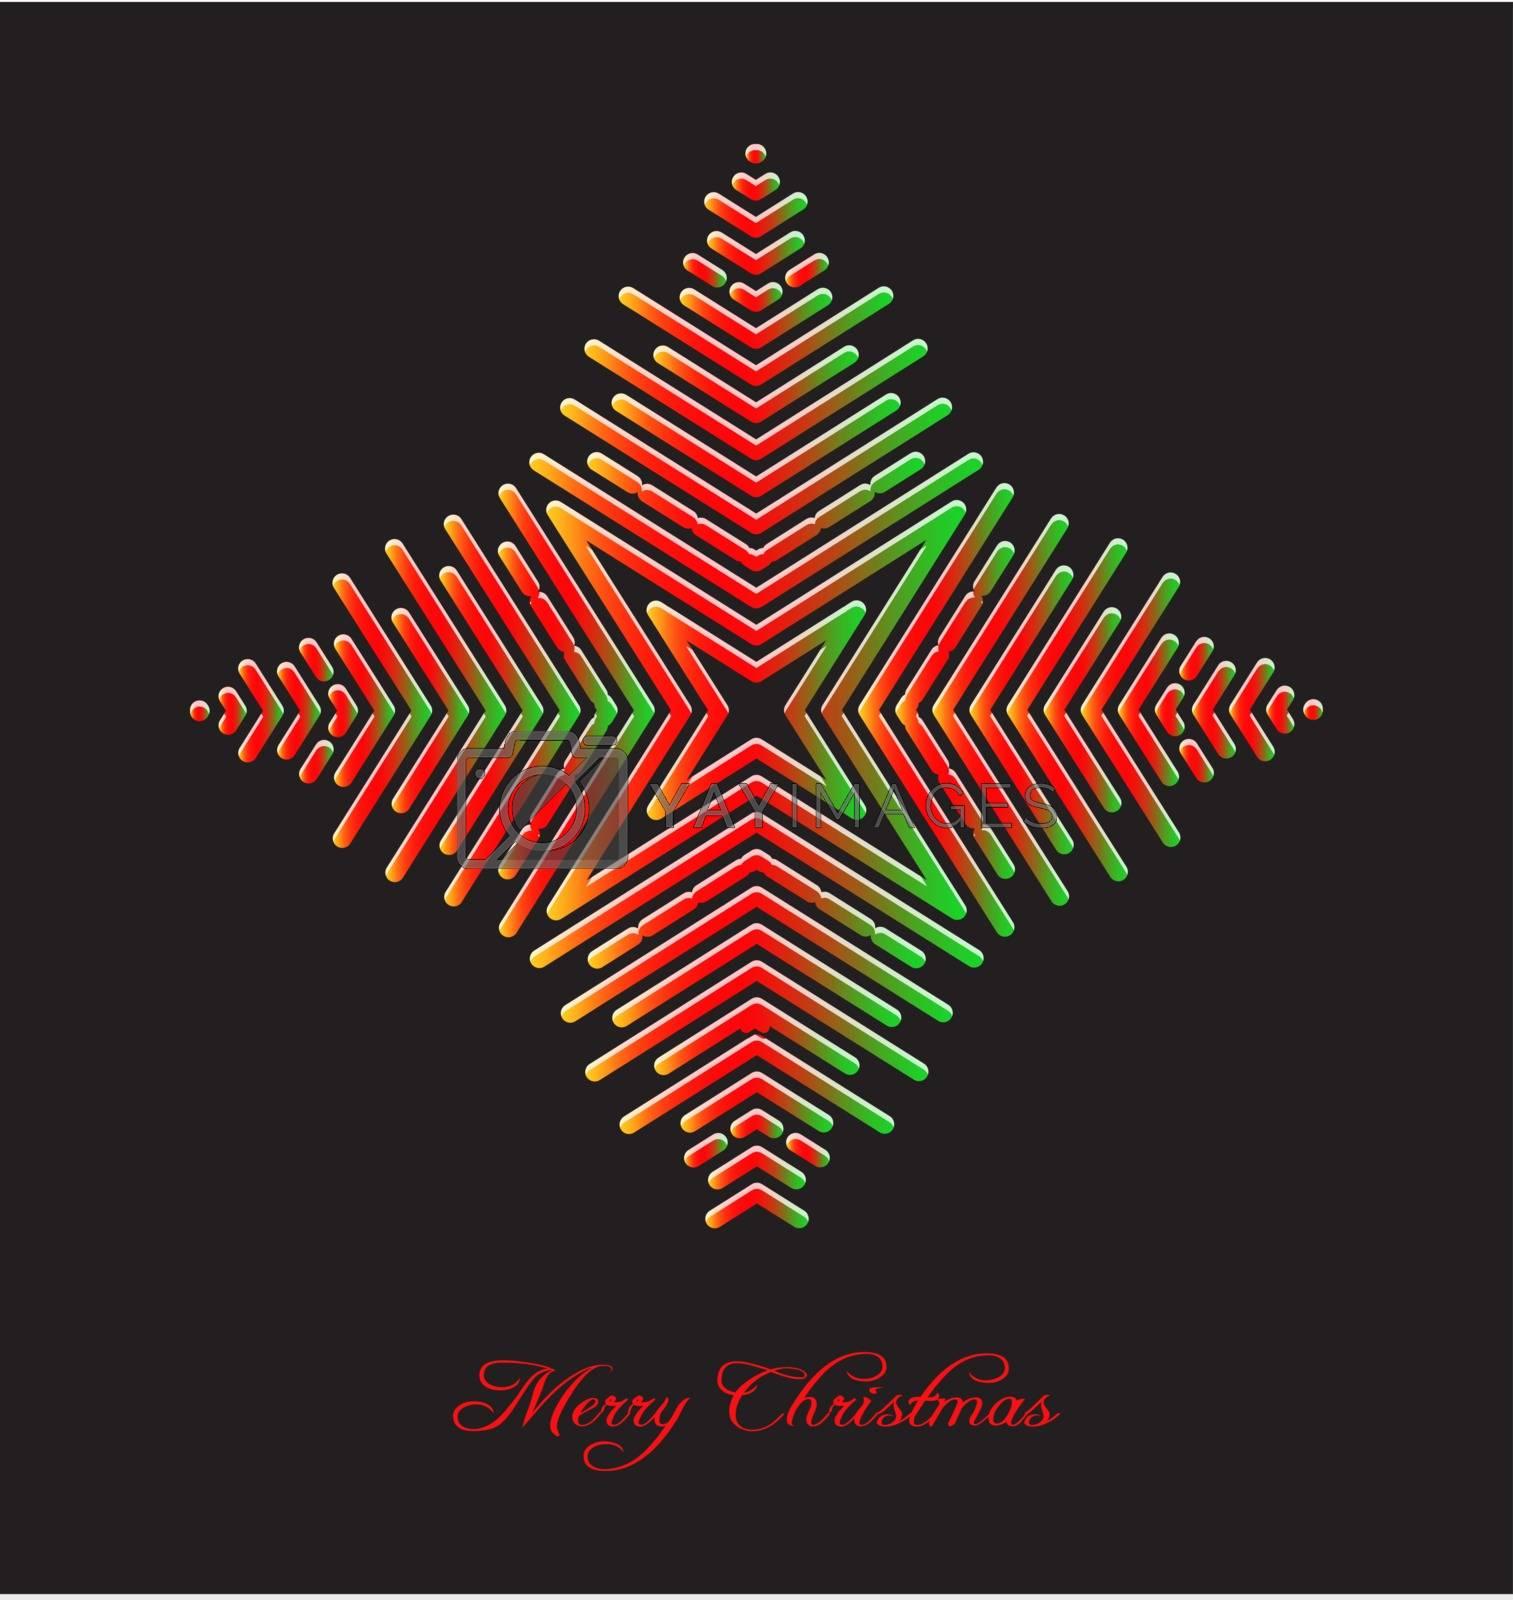 Elegant christmas background with abstract snowflake embellishment foe creative design